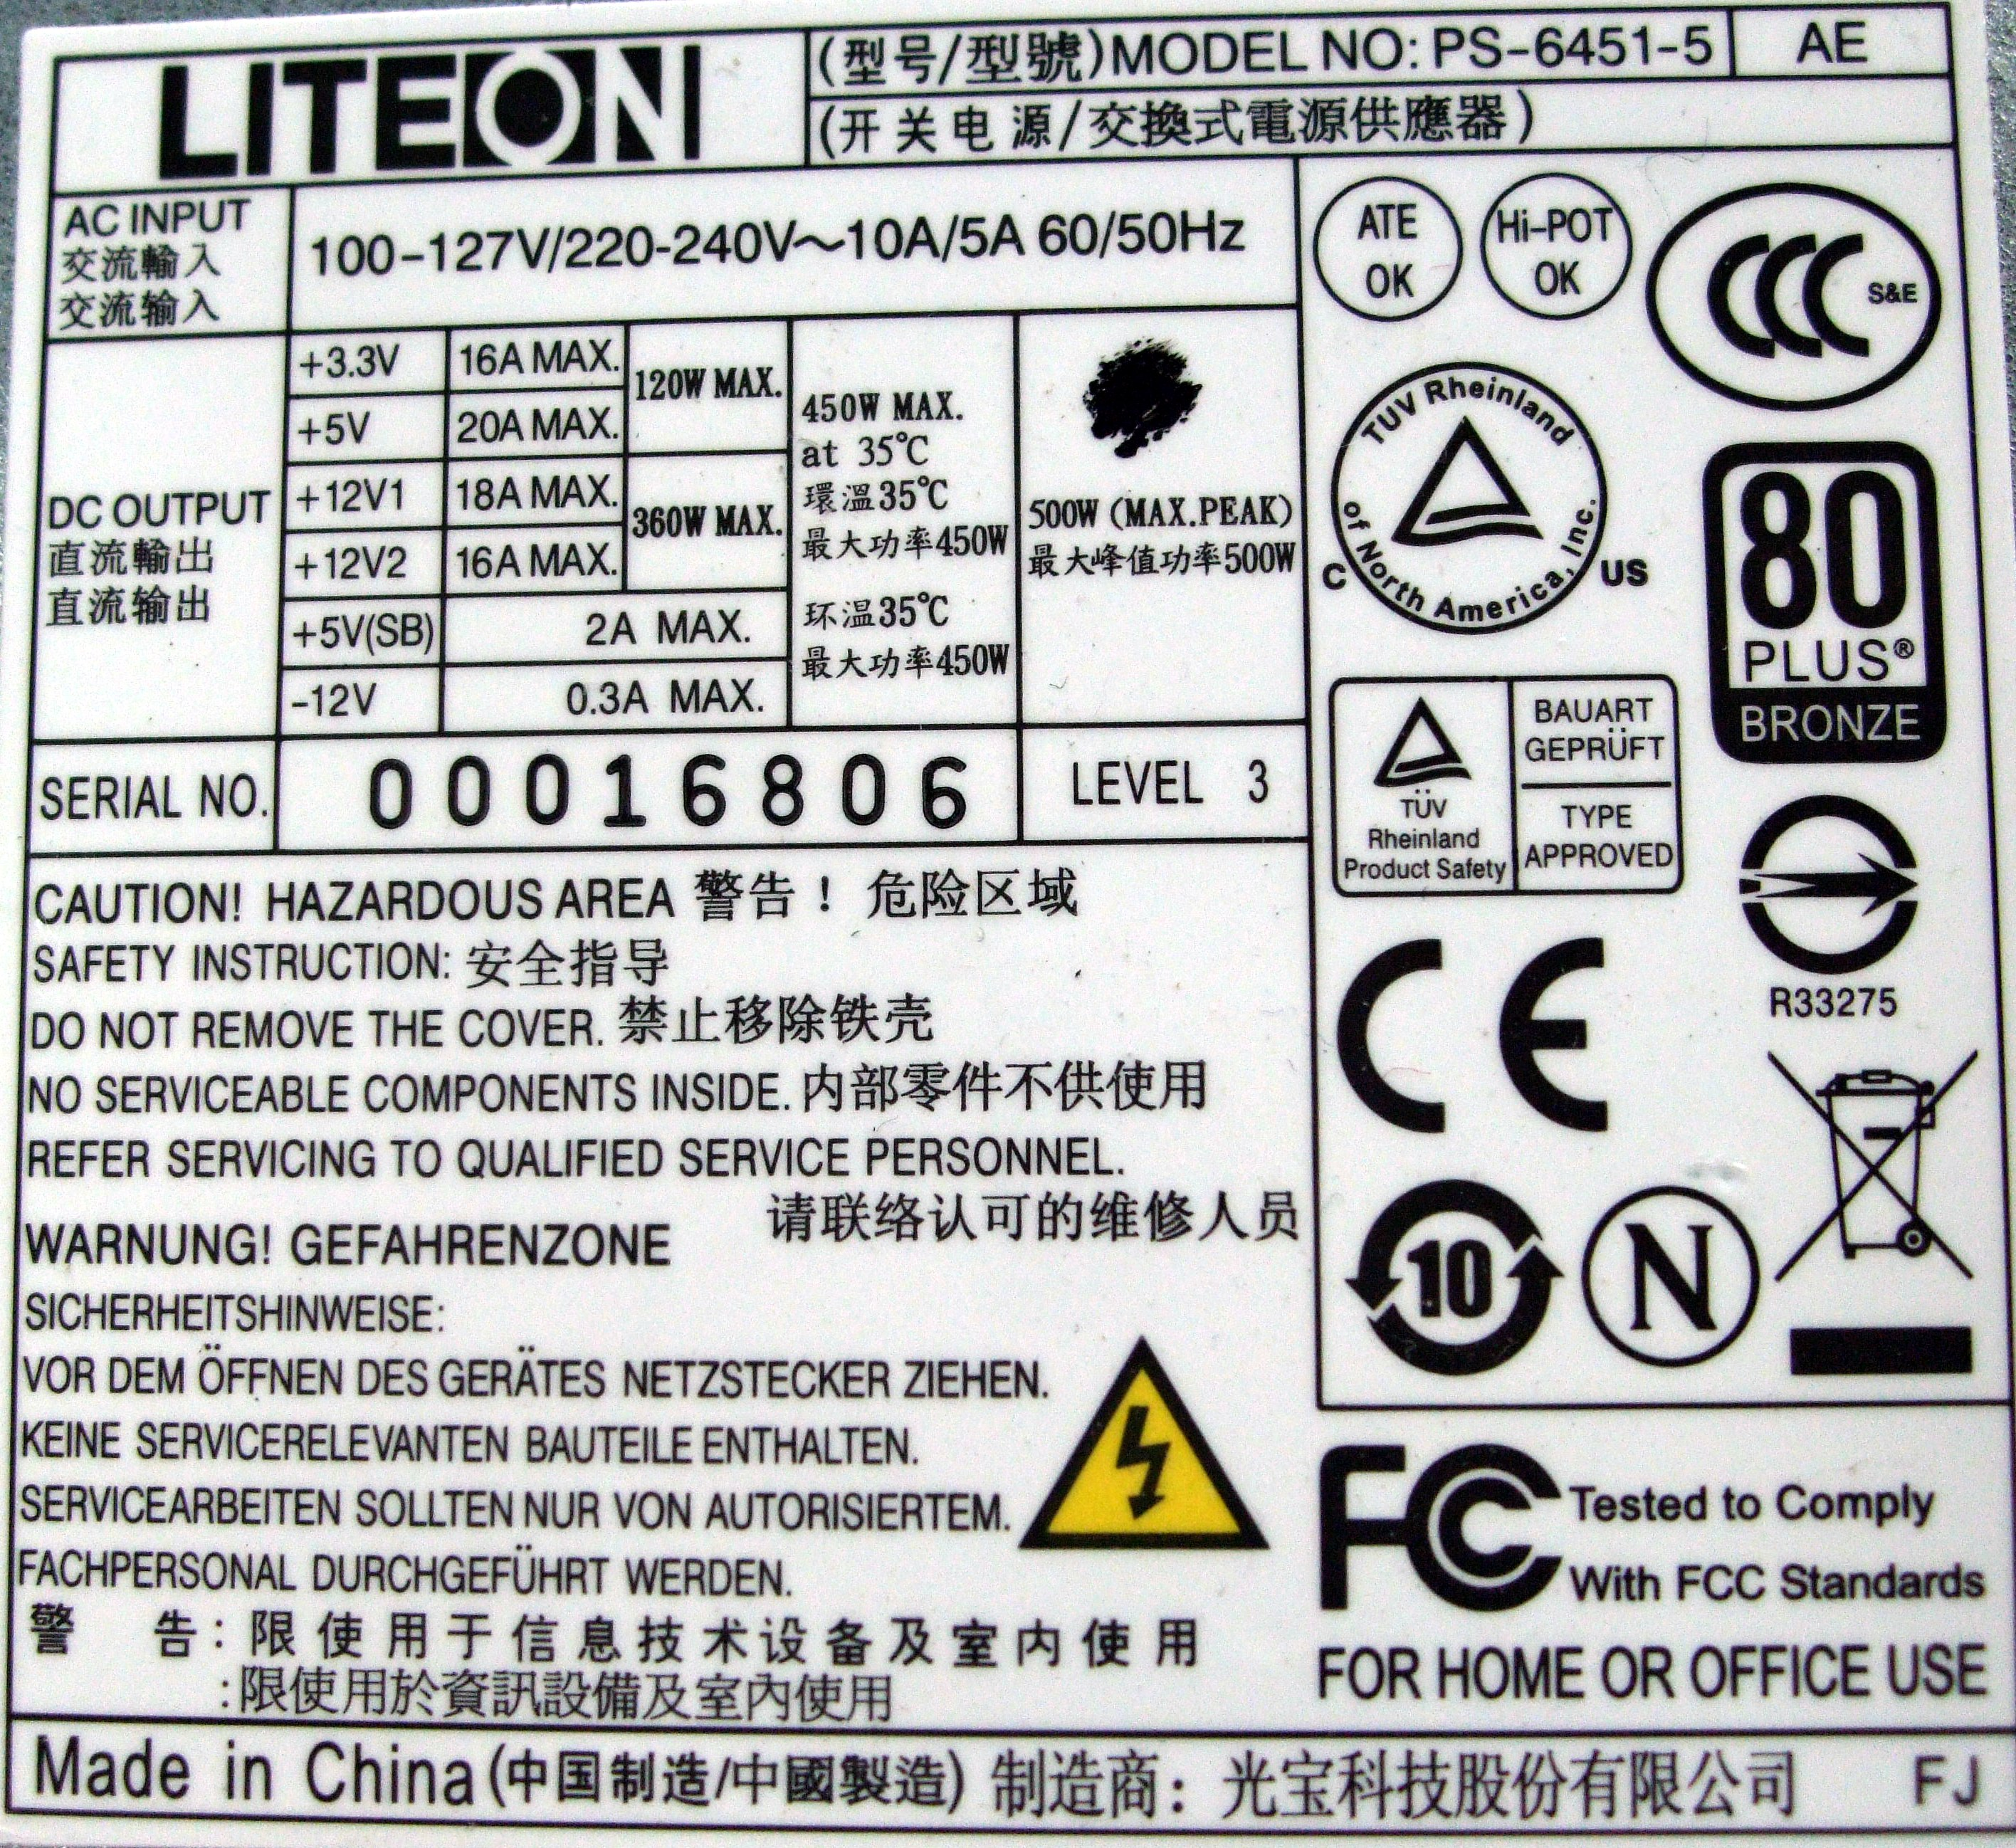 PS-6451-5 LiteOn 500W 24 Pin ATX Power Supply | Power Supplies ...